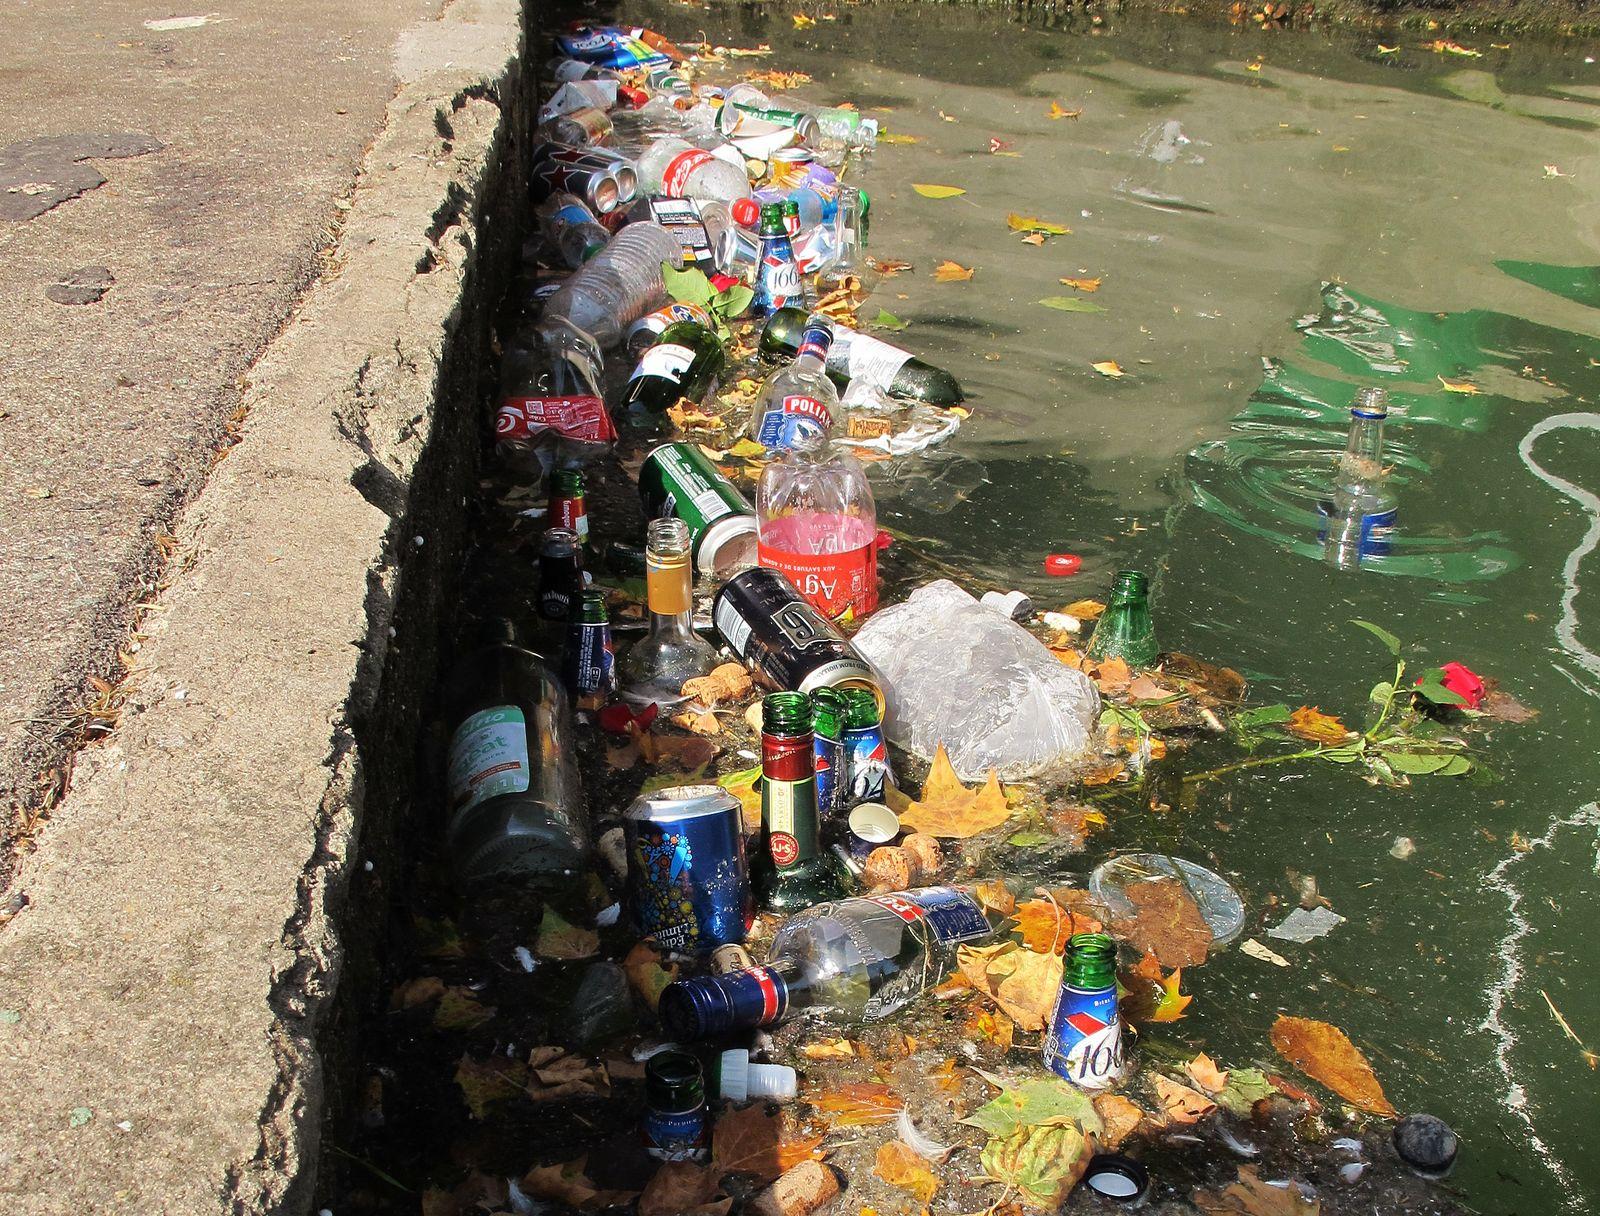 Paris/ Müll im Kanal/